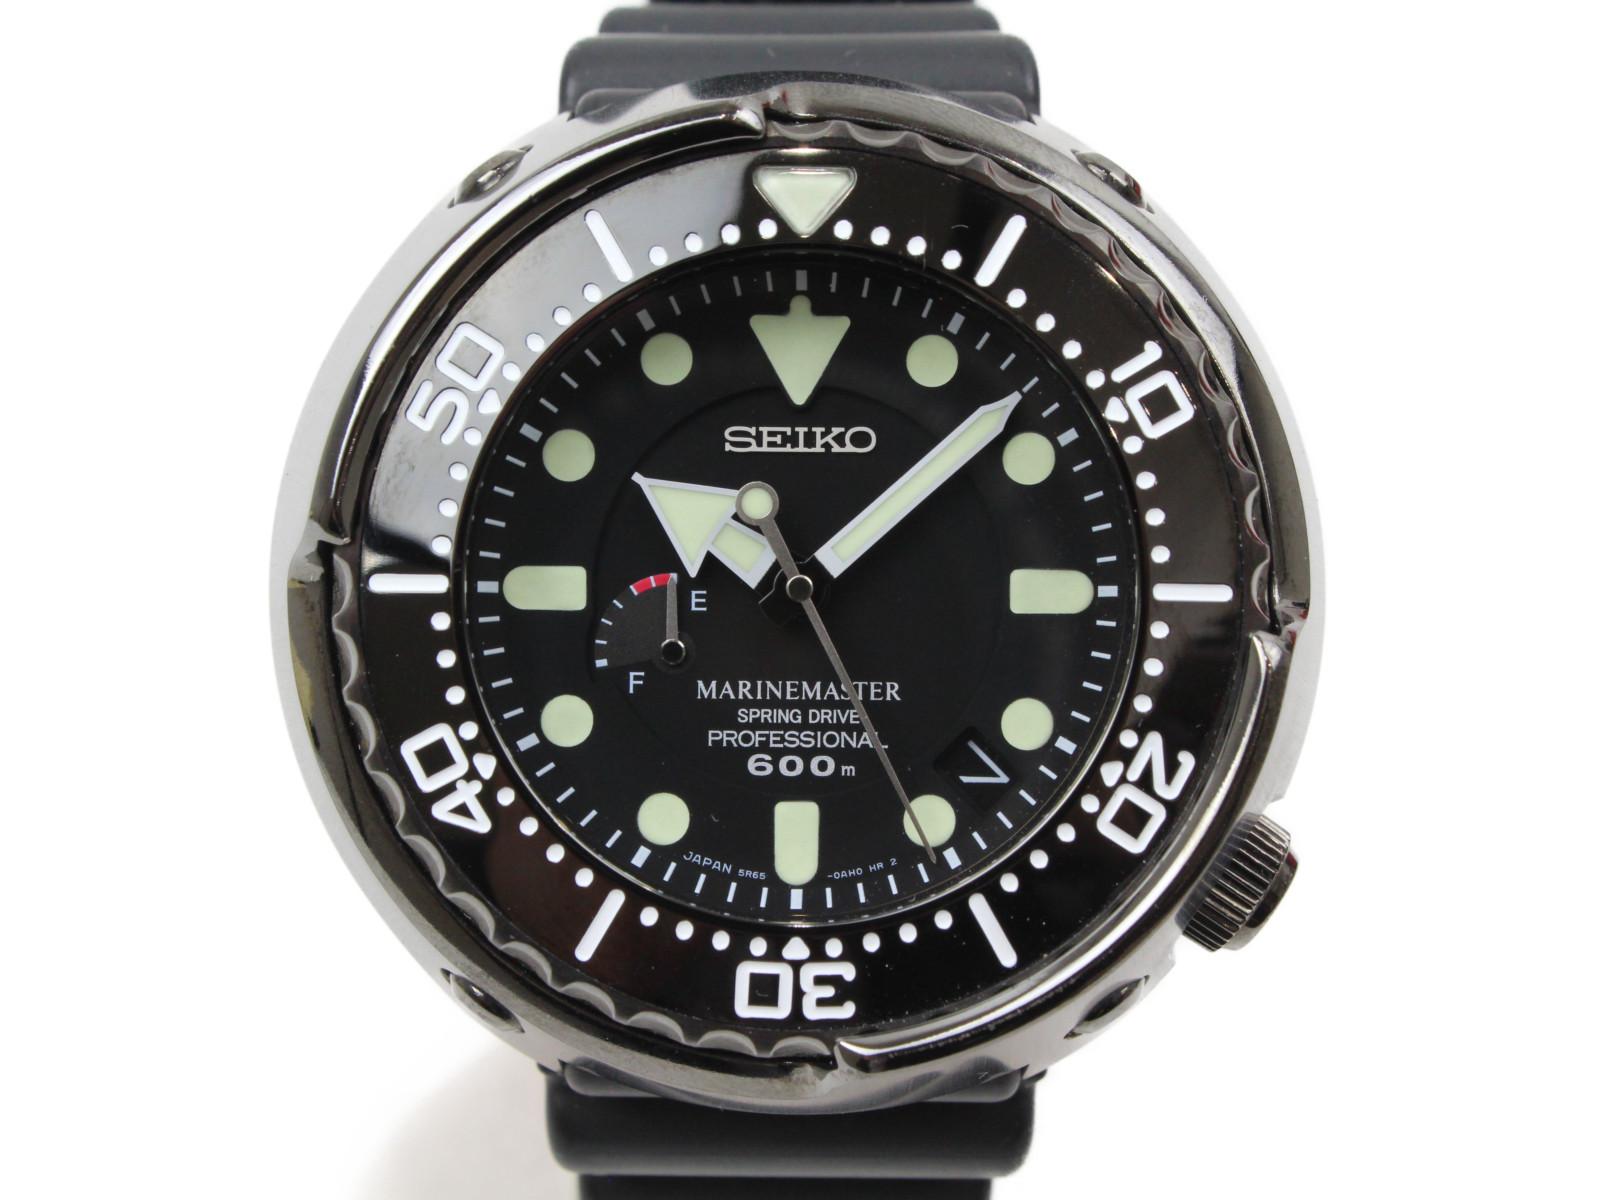 SEIKO セイコー プロスペック マリーンマスター プロフェッショナル SBDB013 自動巻き チタン ラバー ブラック メンズ 腕時計 【中古】